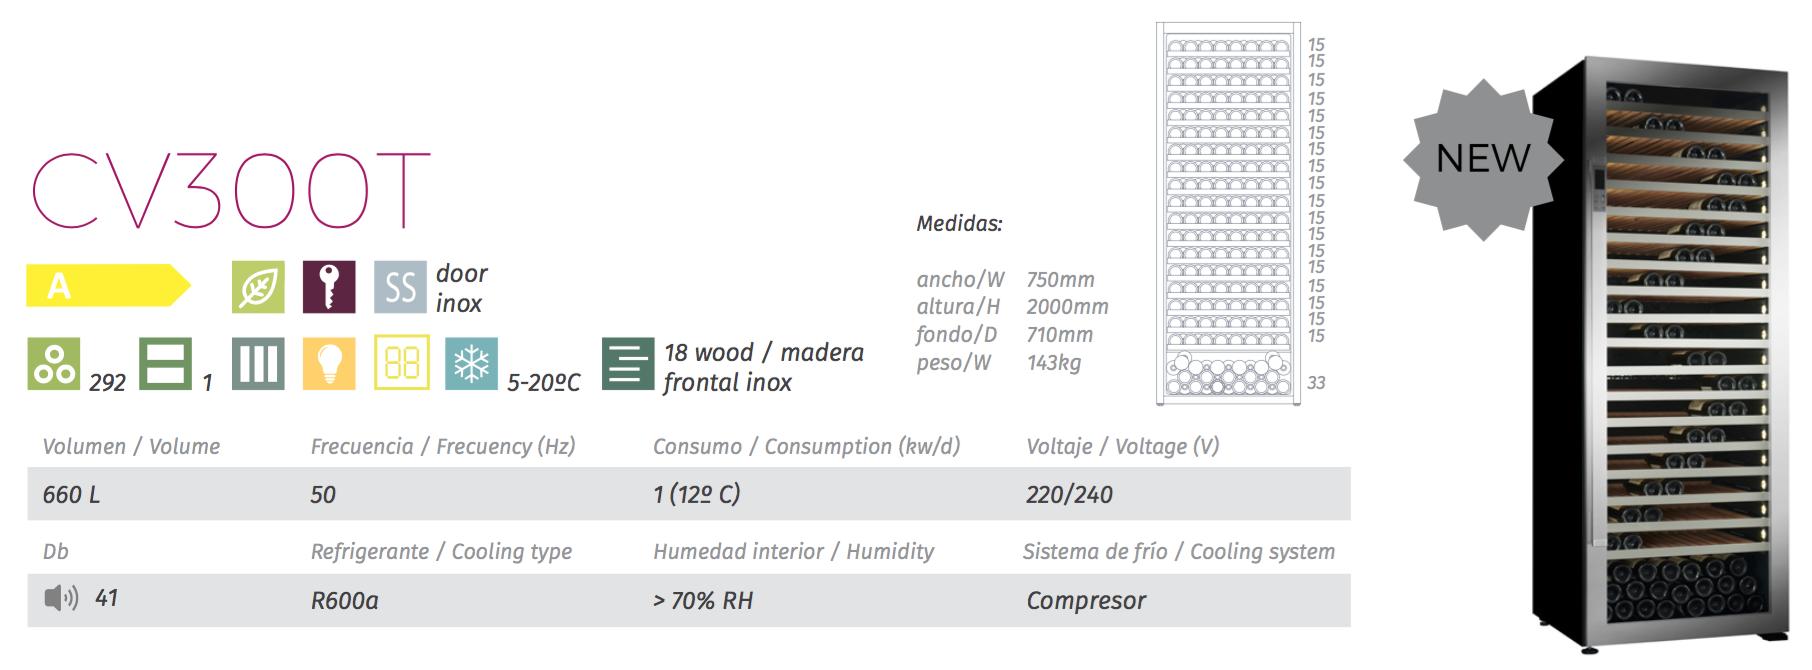 vinoteca cavanova CV300T tabla caracteristicas